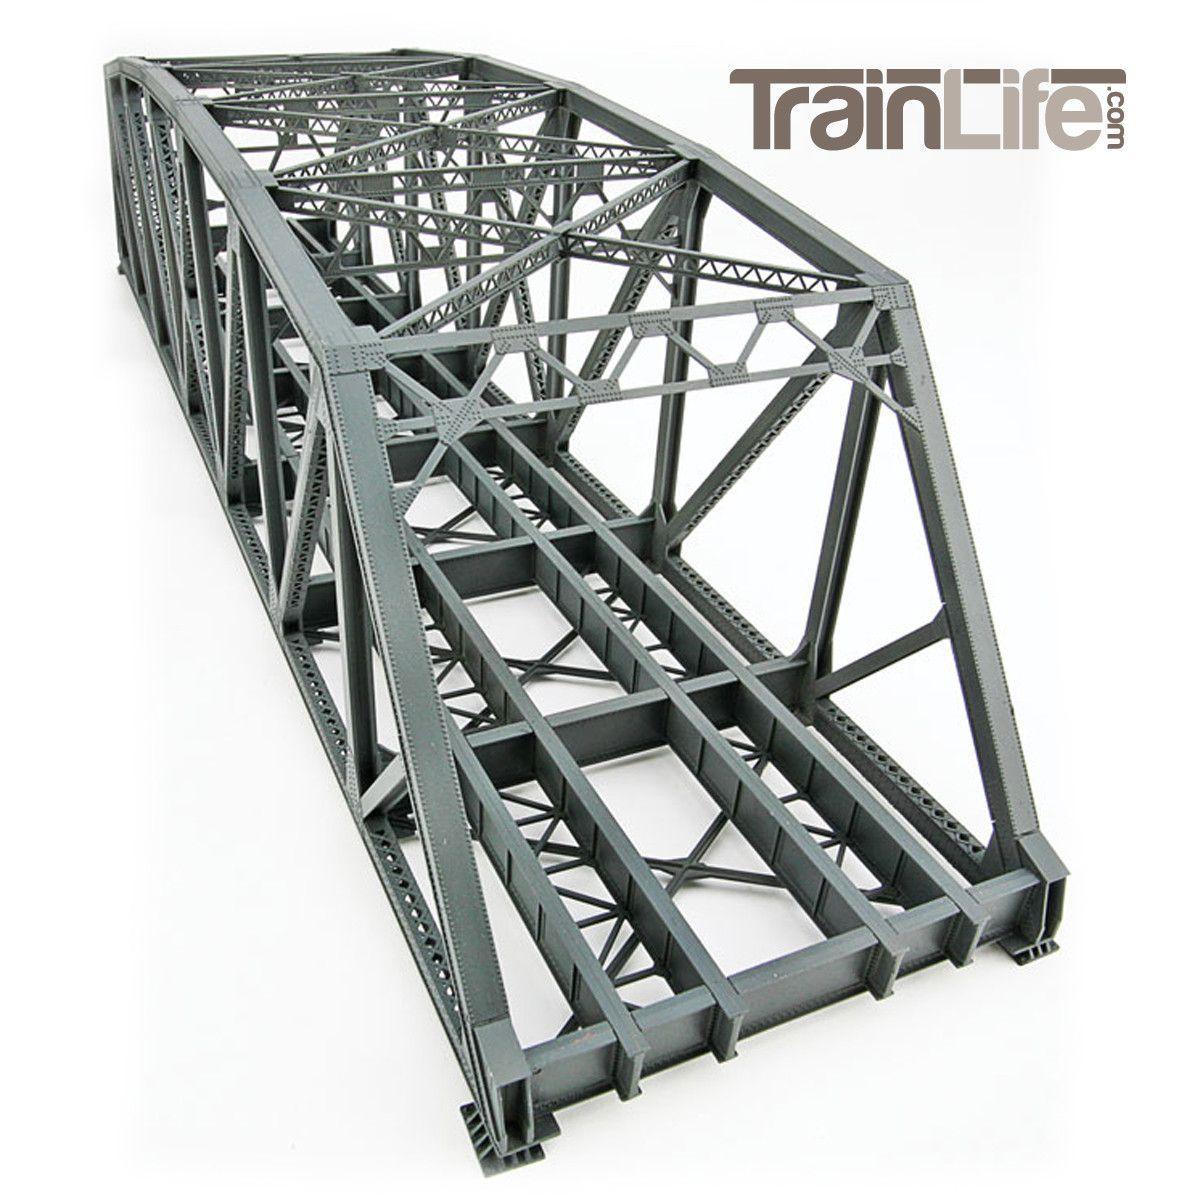 Ho Scale Arched Pratt Truss Railroad Bridge Double Track Model Trains Railroad Bridge Model Railroad